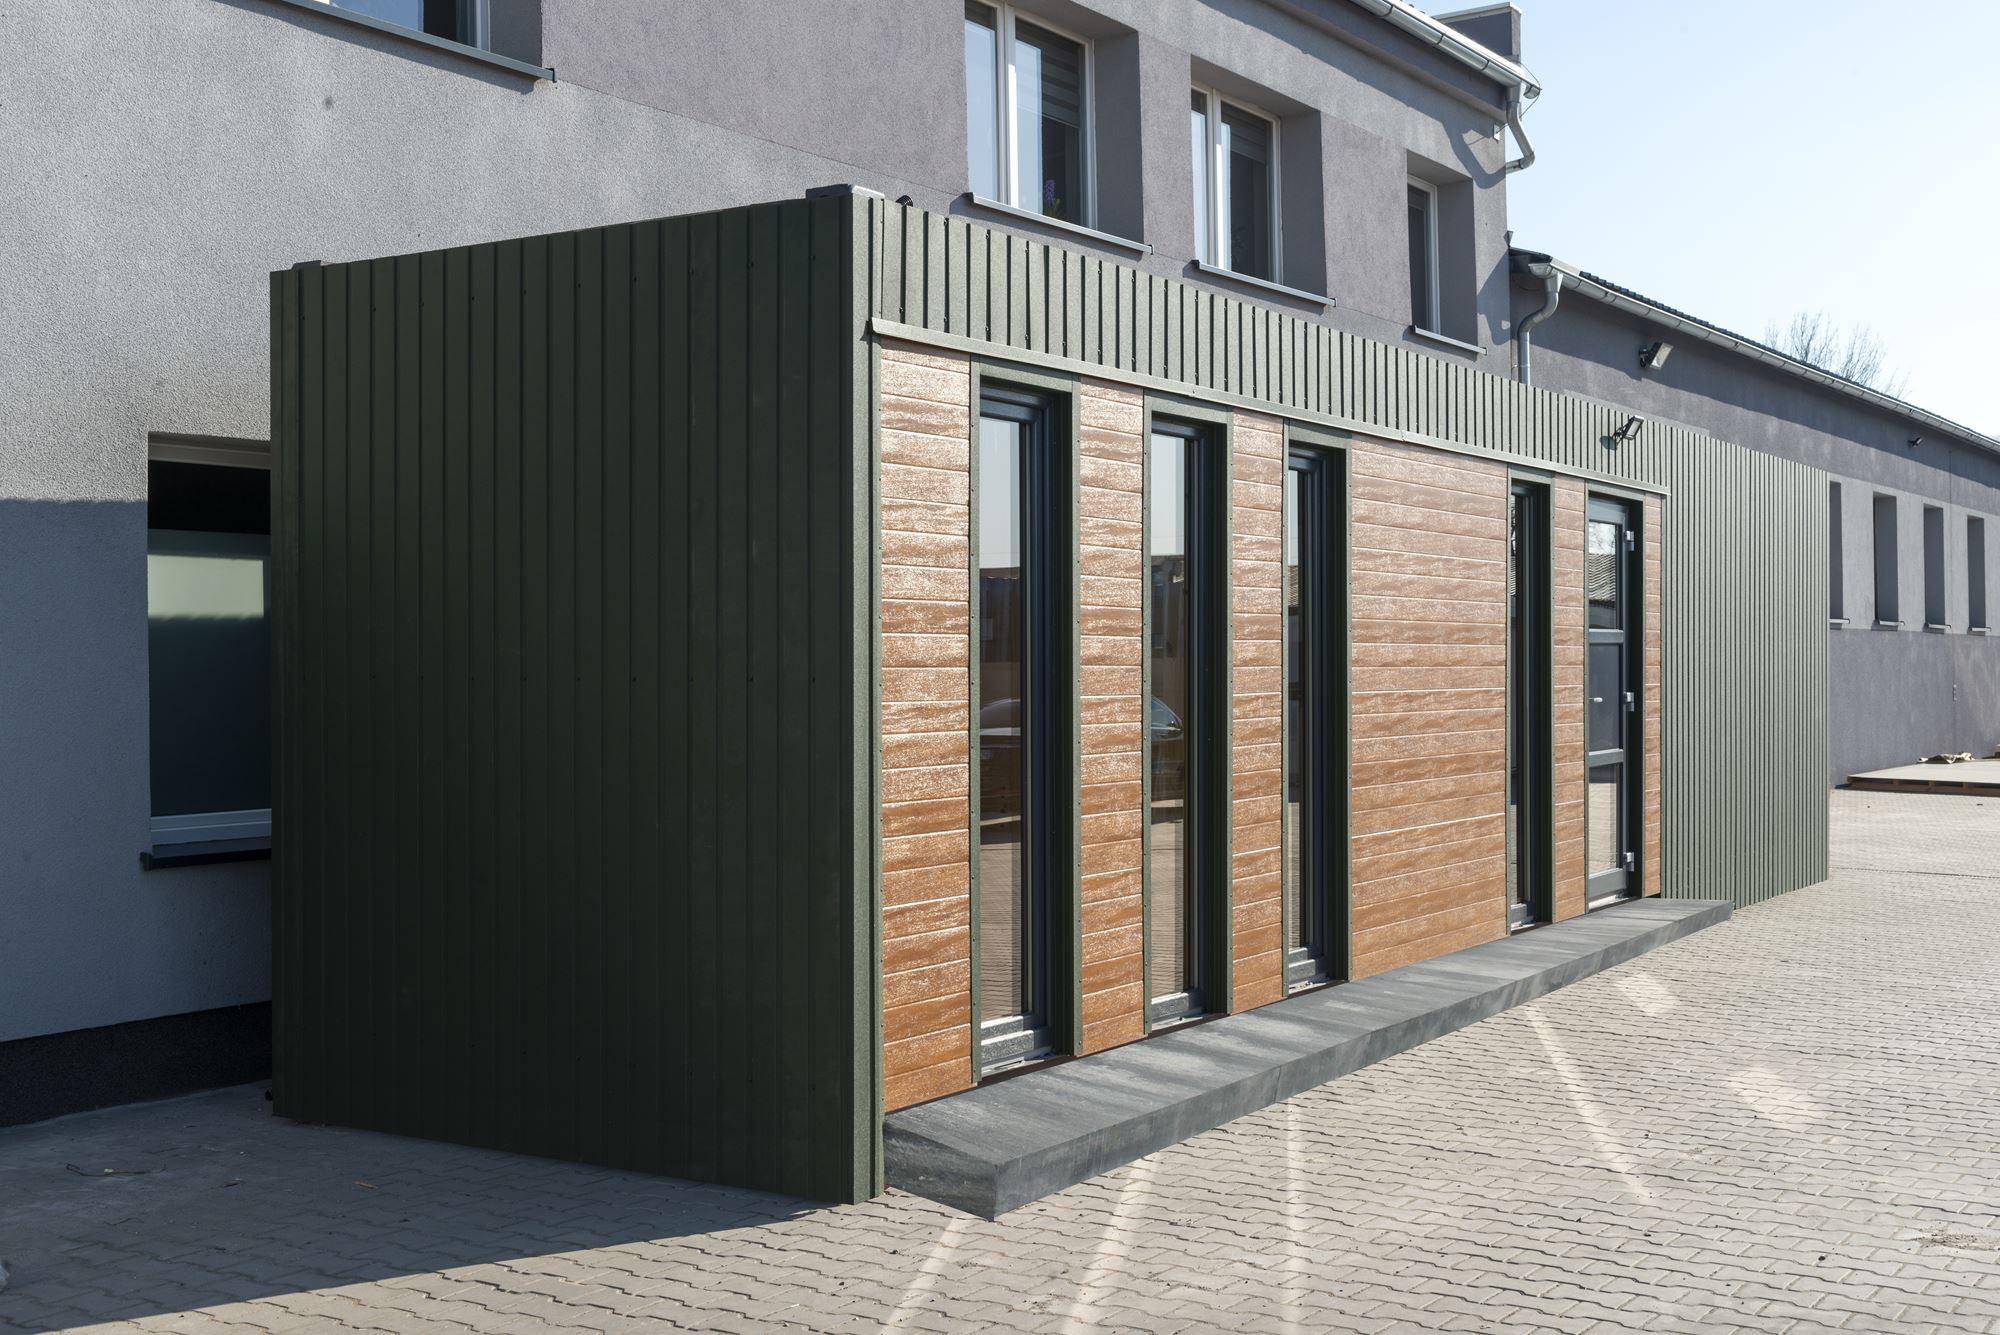 Jagdhaus mit integrierter Kühlzelle